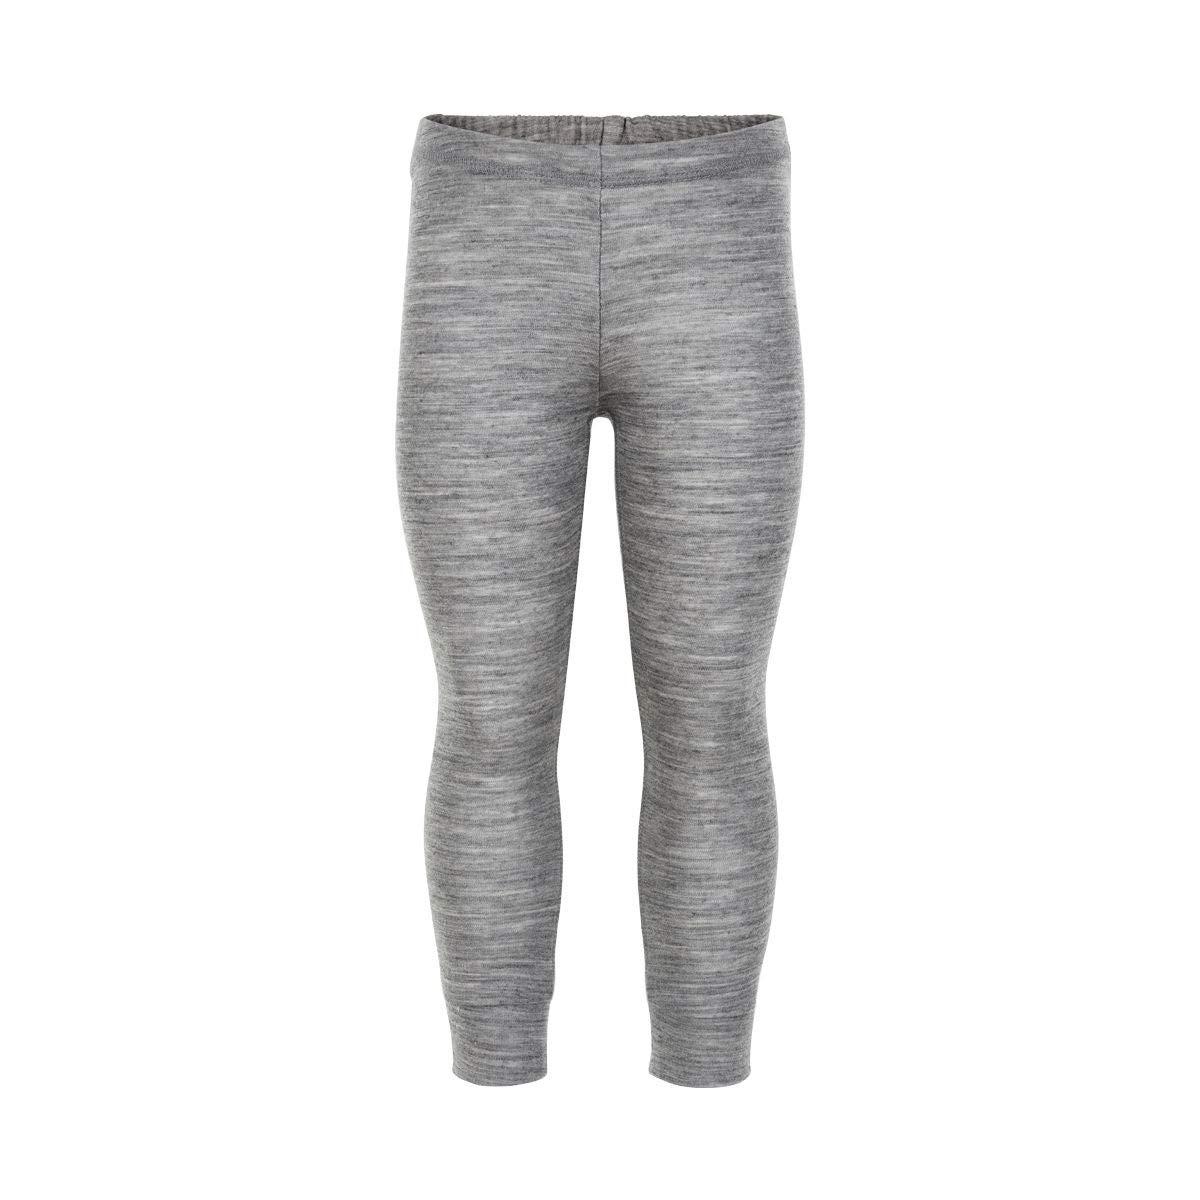 Me Too by Scandinavian Kidz Kids Thermal Underwear: Leggings-Base Layer-Bottoms-Underwear 2 Col. Sizes 2Y-6Y